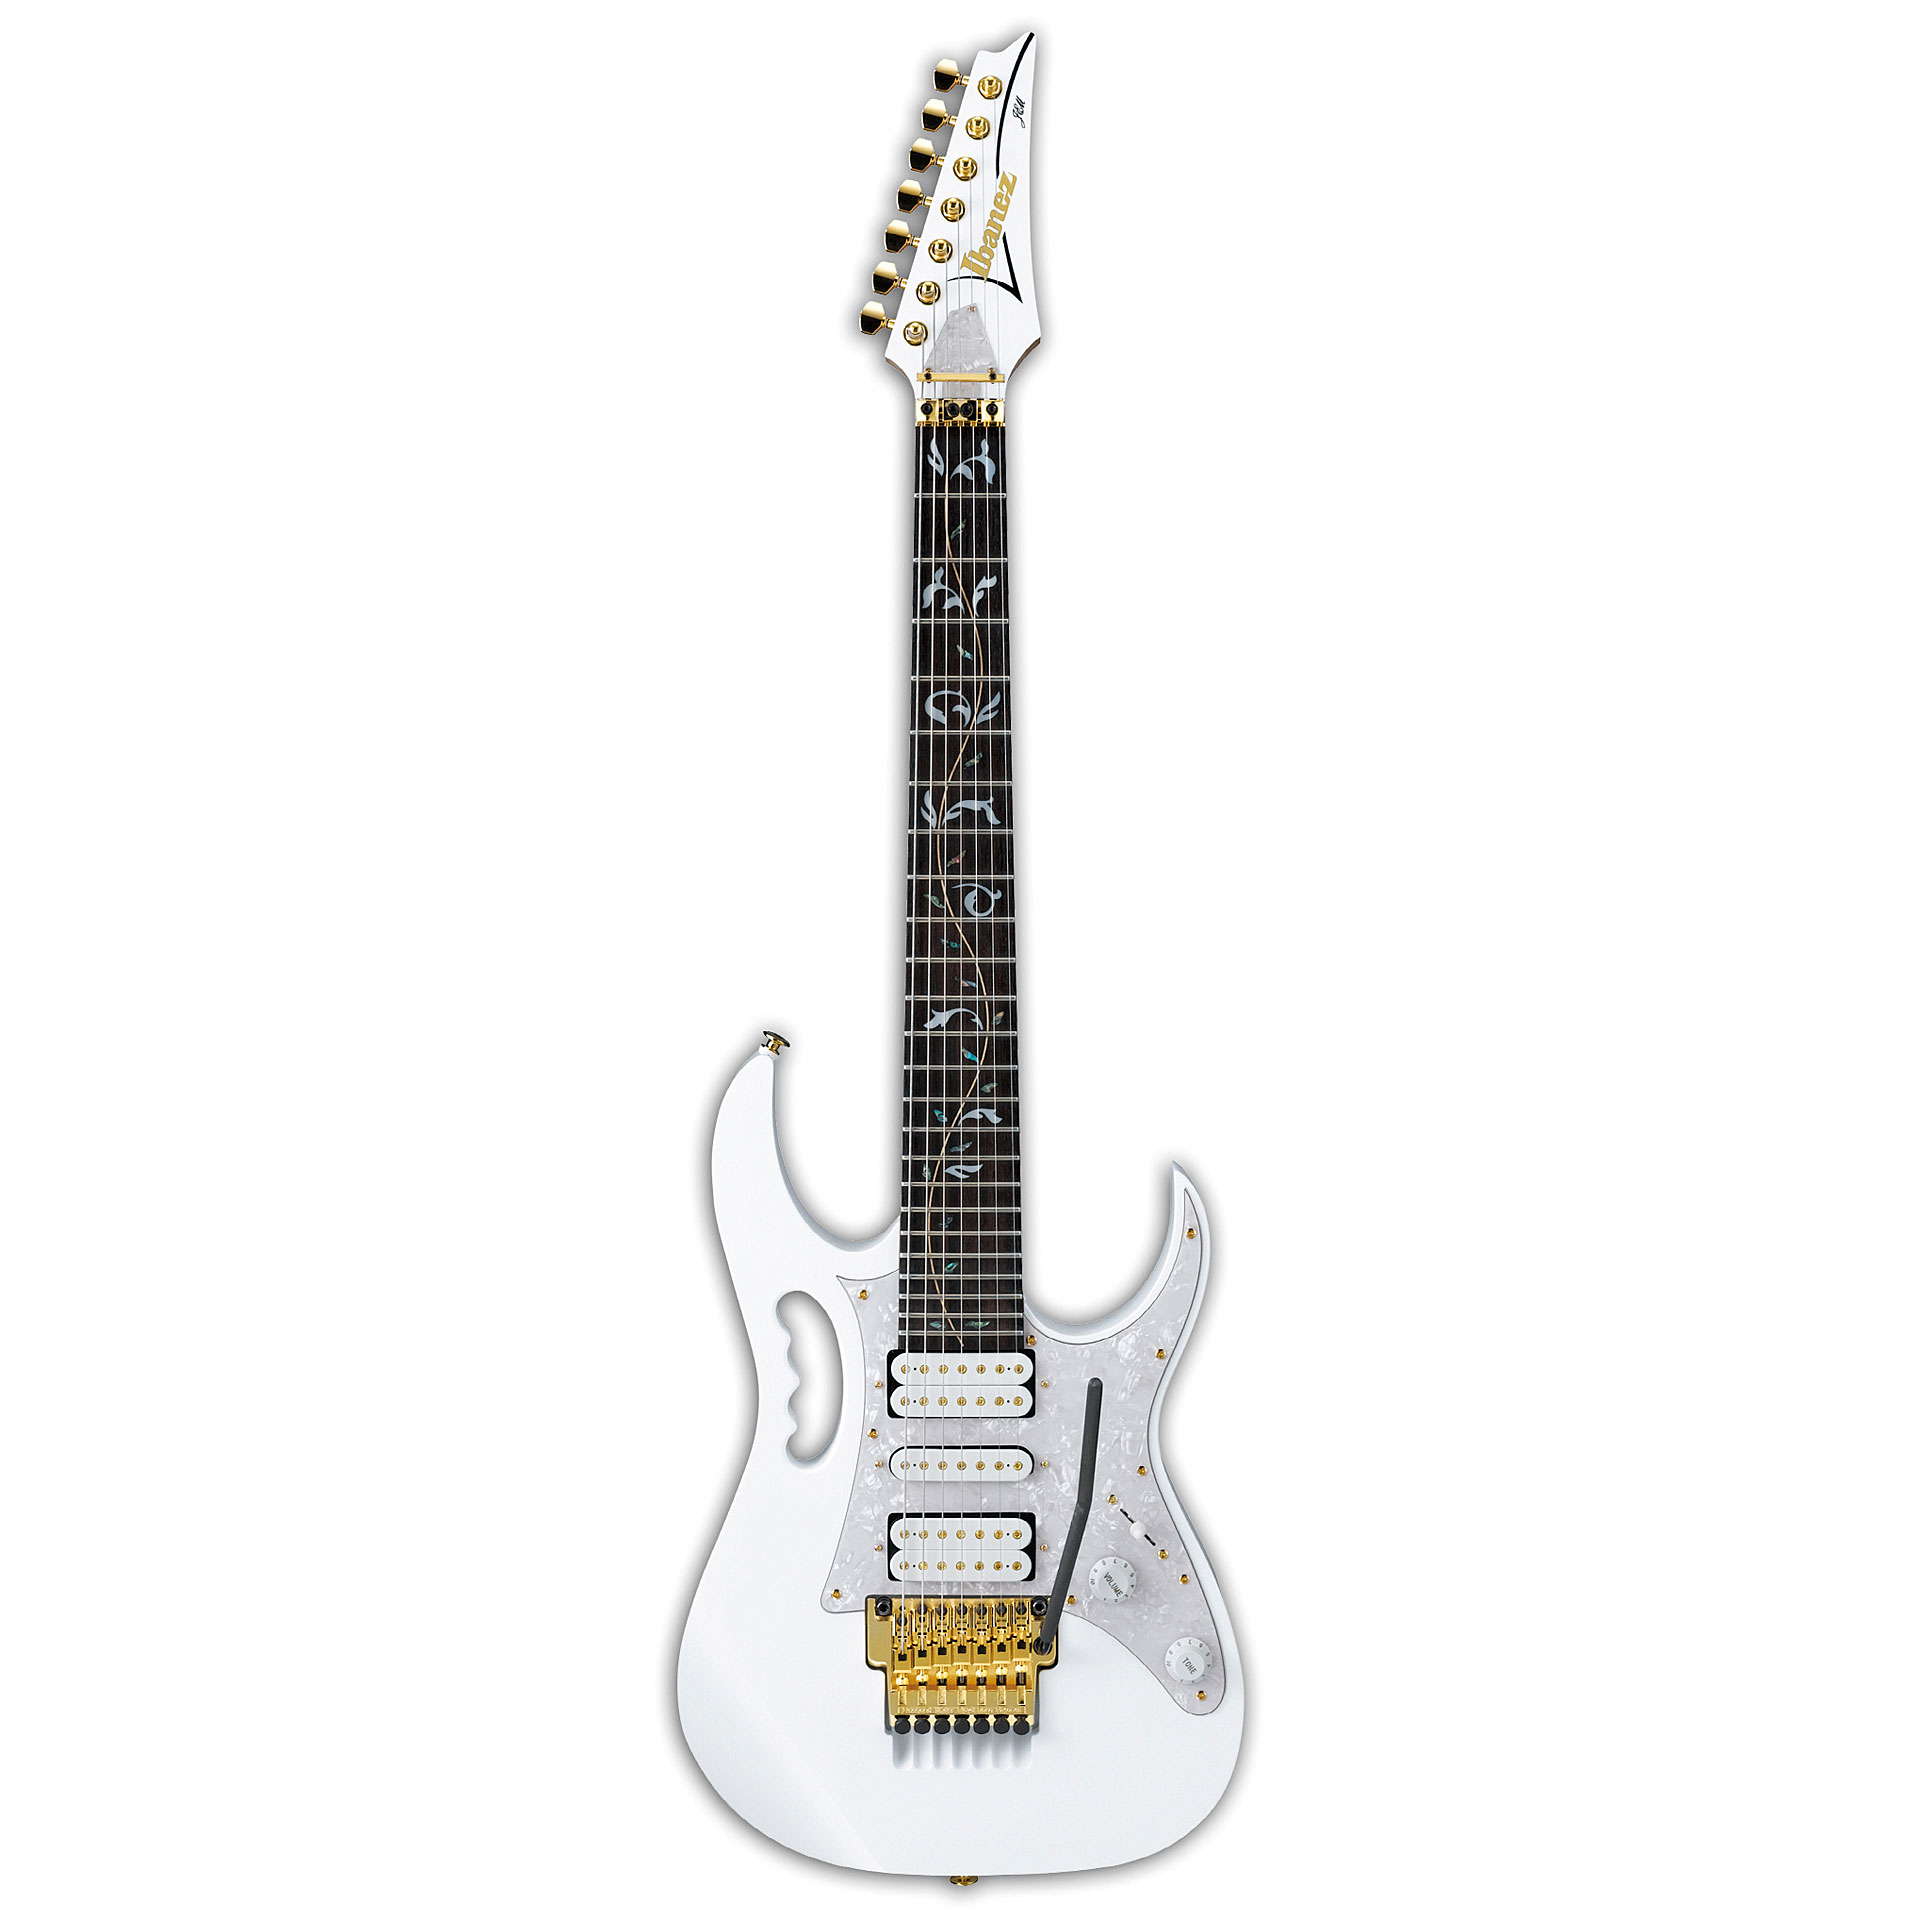 Ibanez Jem7v7 Wh Steve Vai E Gitarre